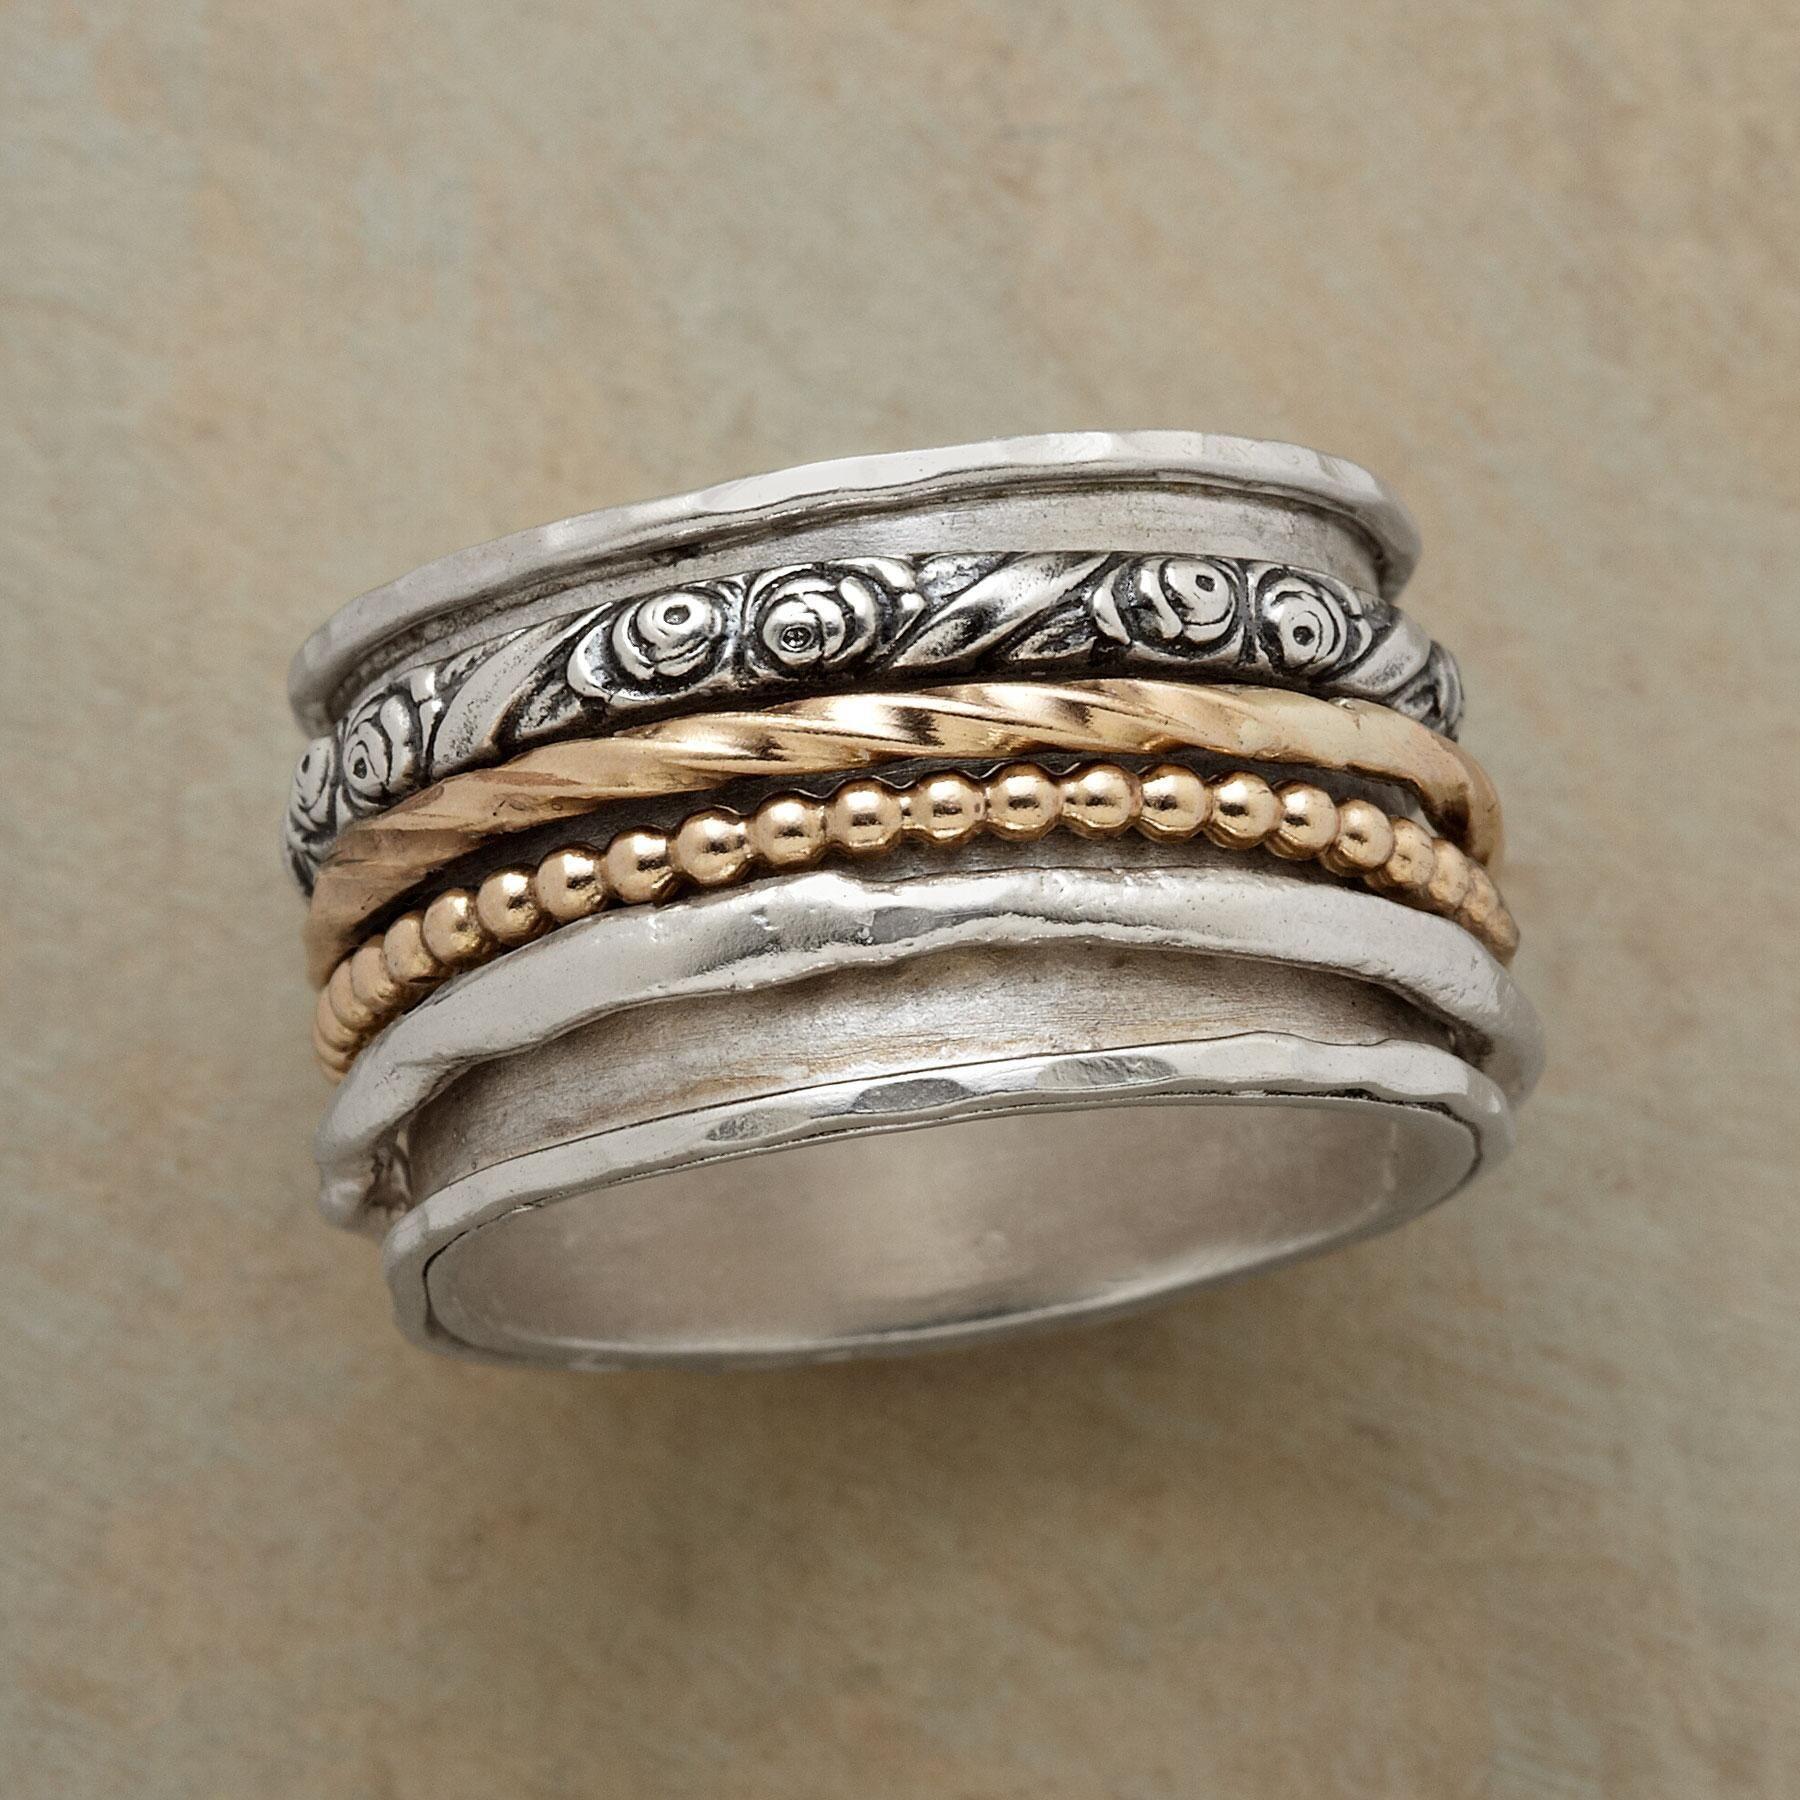 artisan ring unique ring engagement ring silver ring tribal ring band ring statment ring rings LAYERS RING!! silver ring